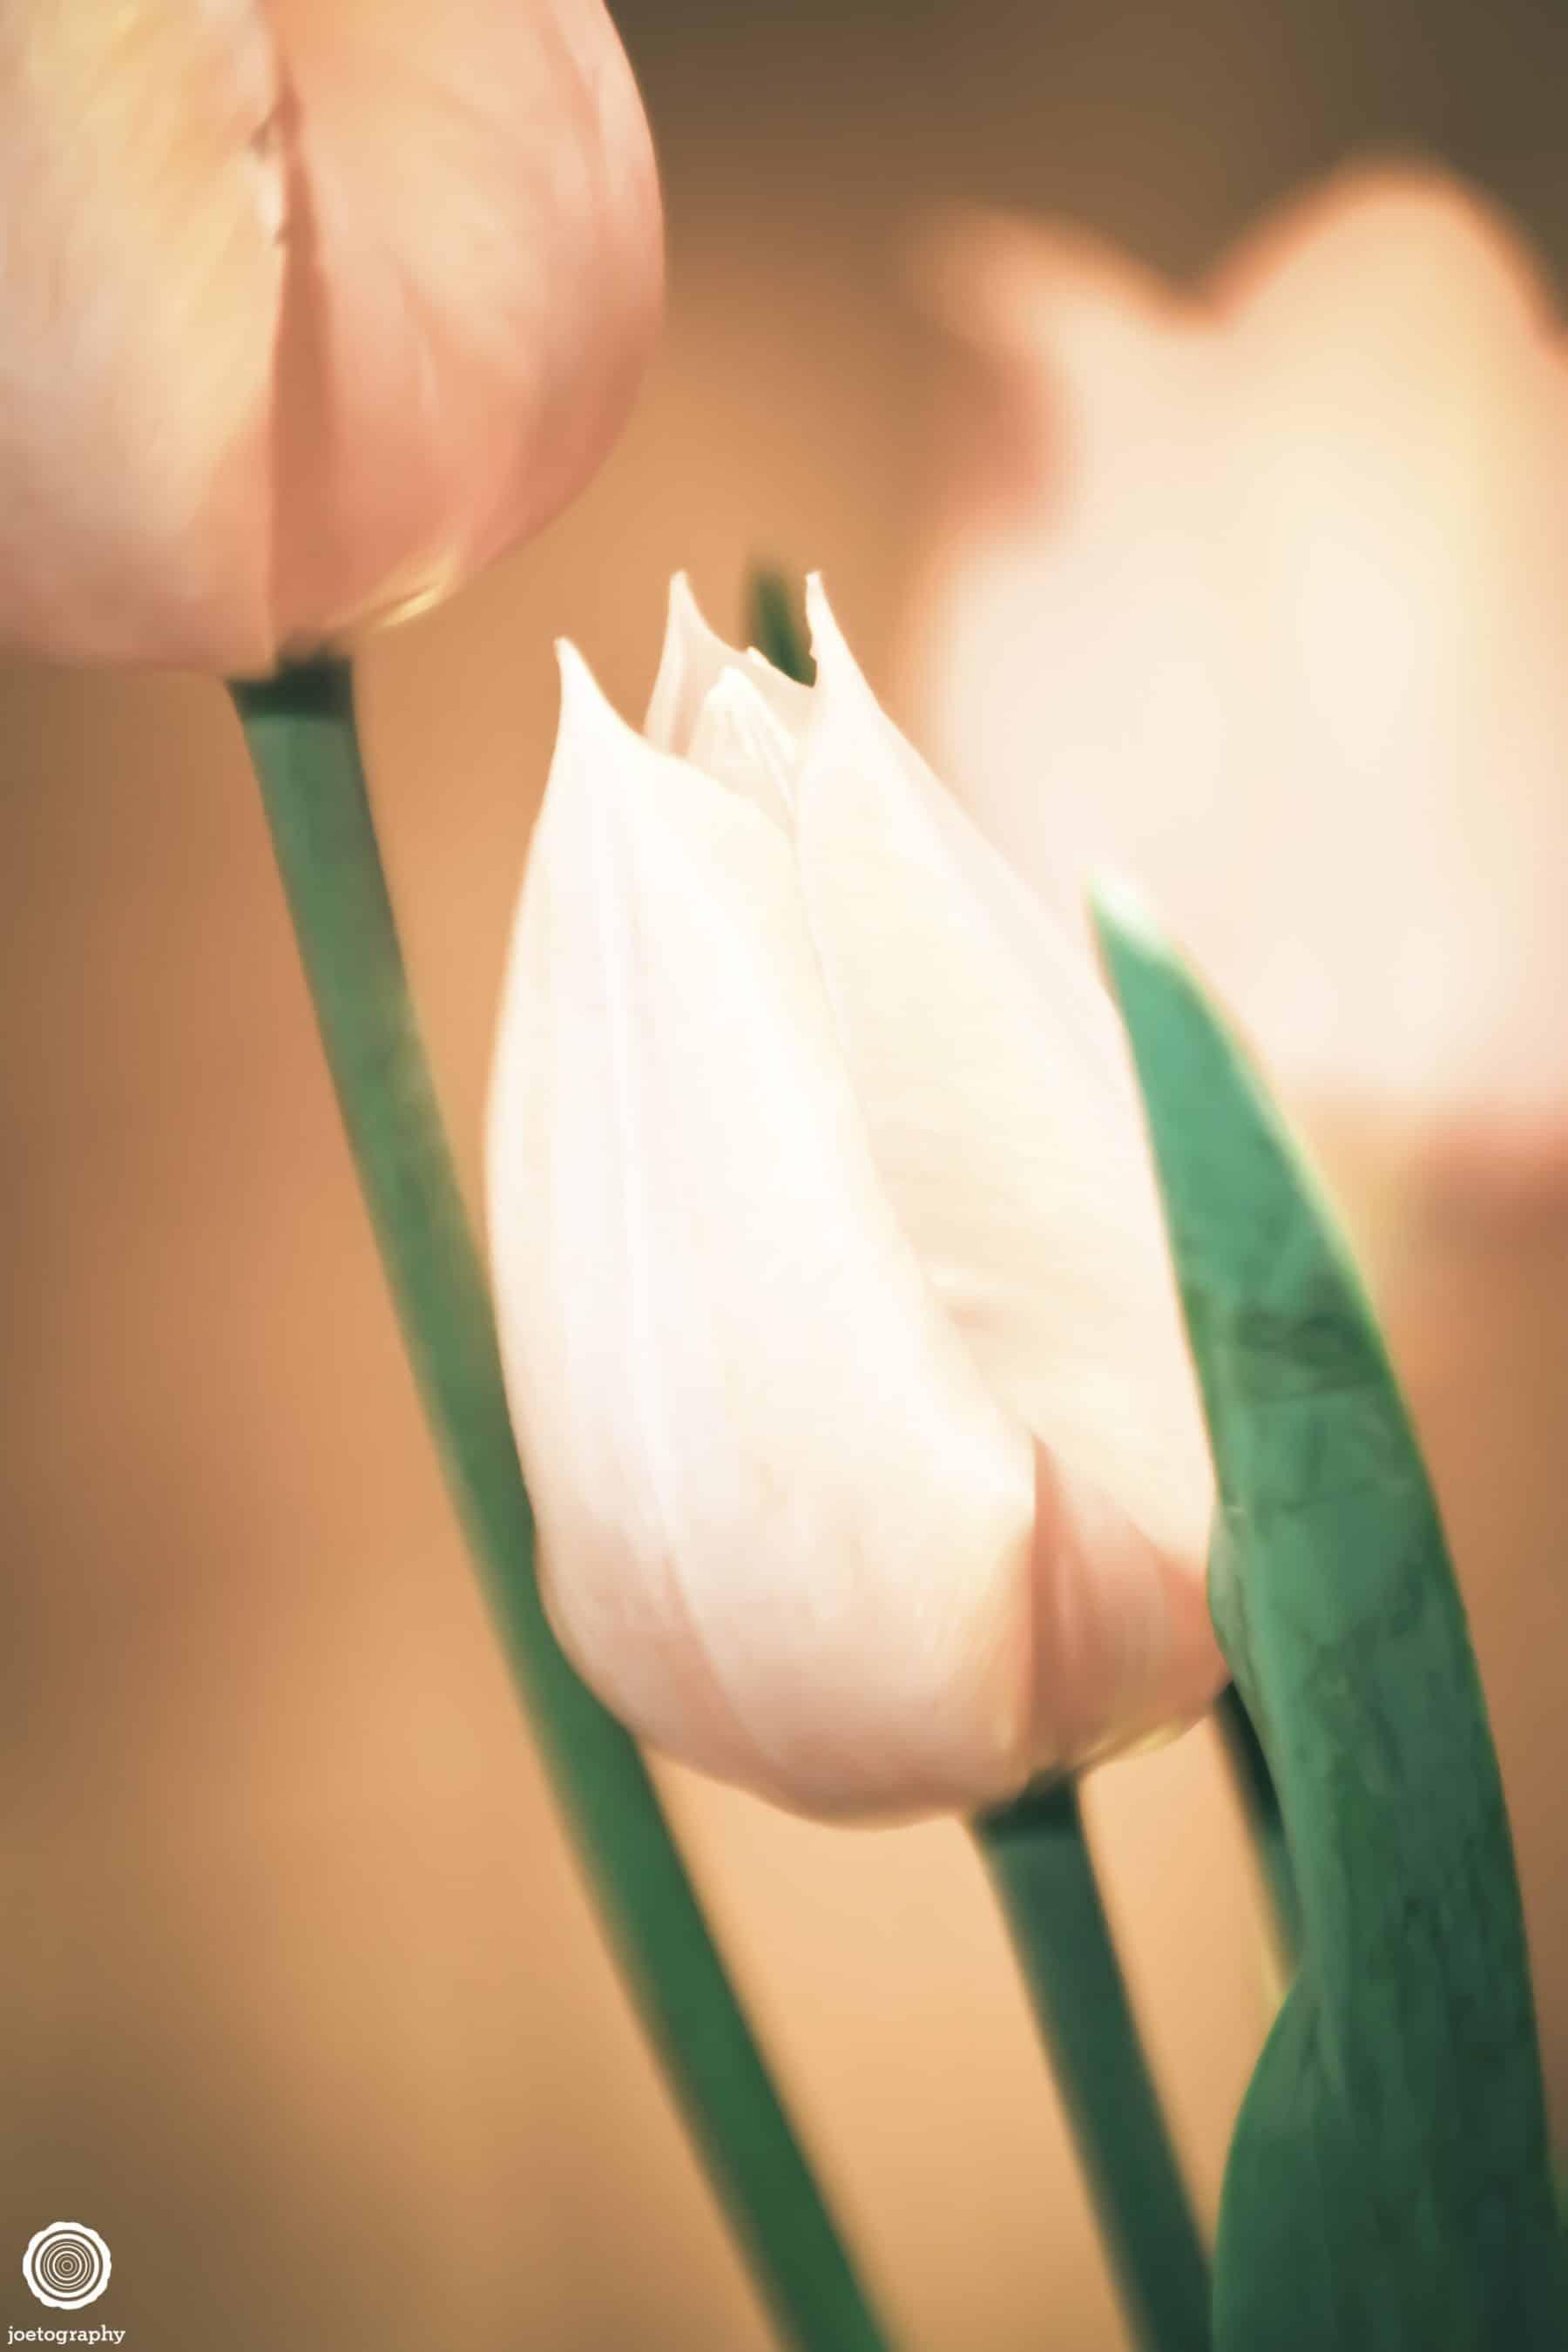 anatomy-tulip-nature-photography-indianapolis-1